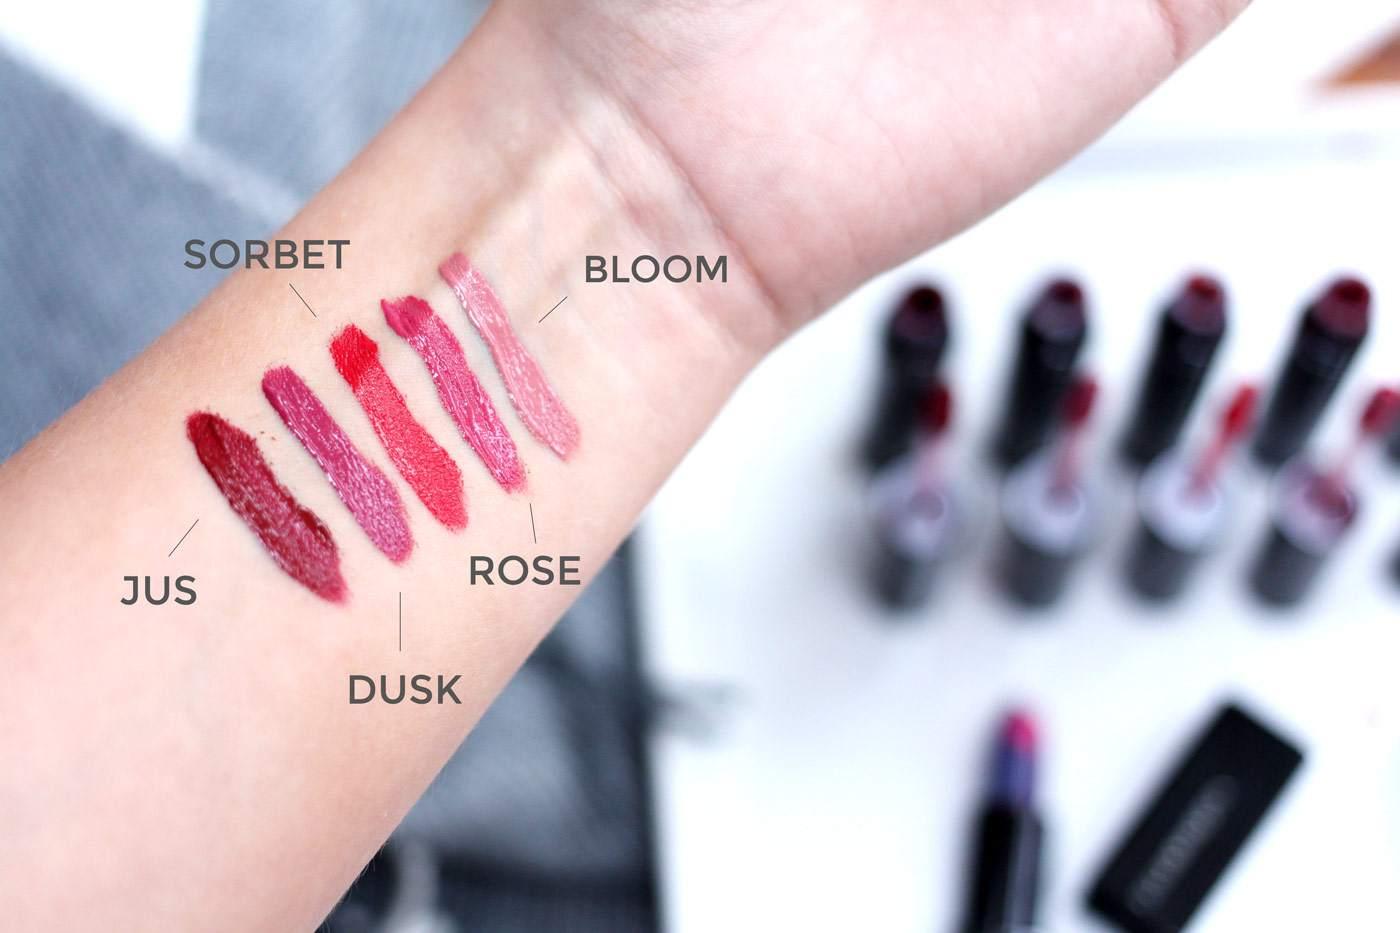 illamasqua-lip-lures-review-rose-sorbet-bloom-jus-dusk-2